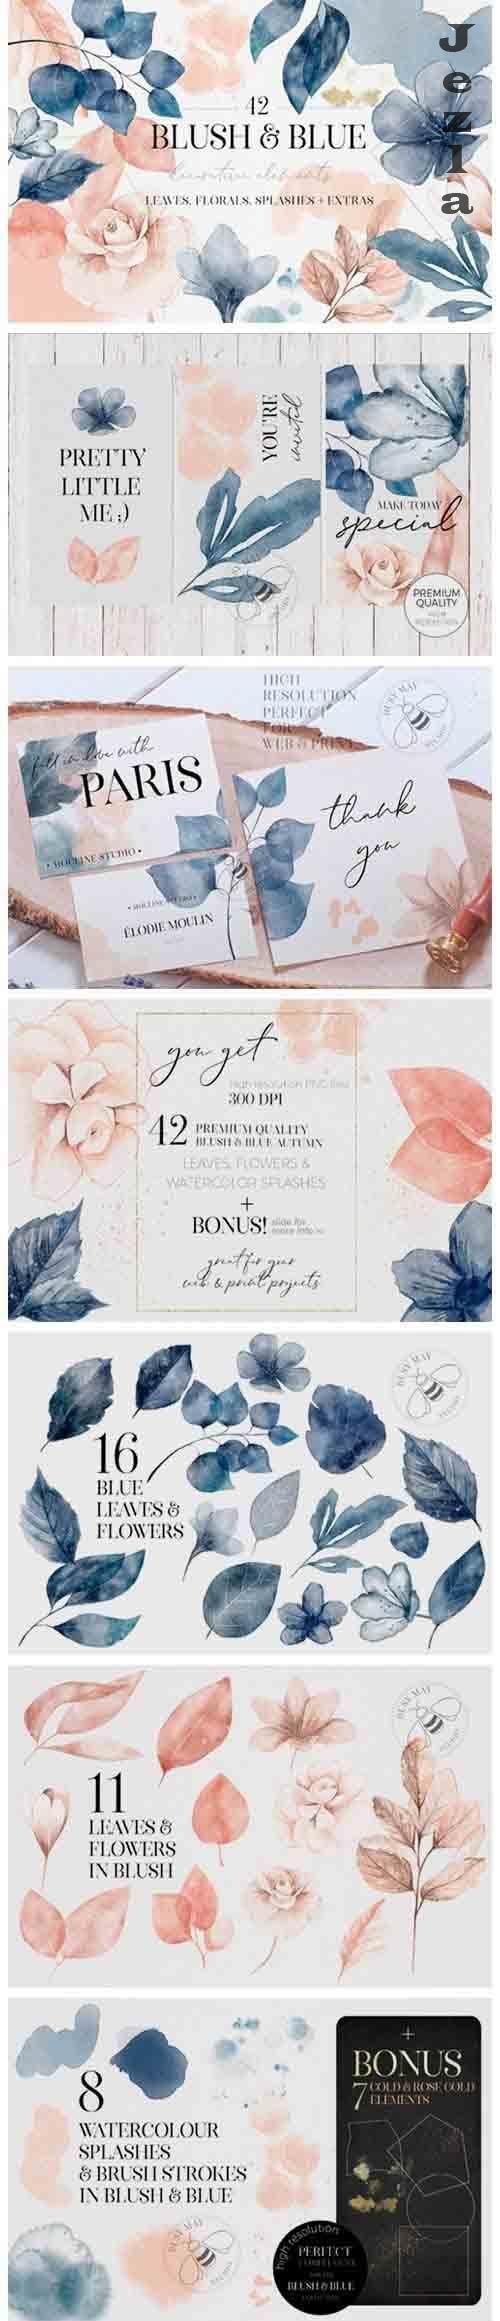 Blush and Blue Leaves Florals Watercolor Splashes Plus Bonus - 1016634